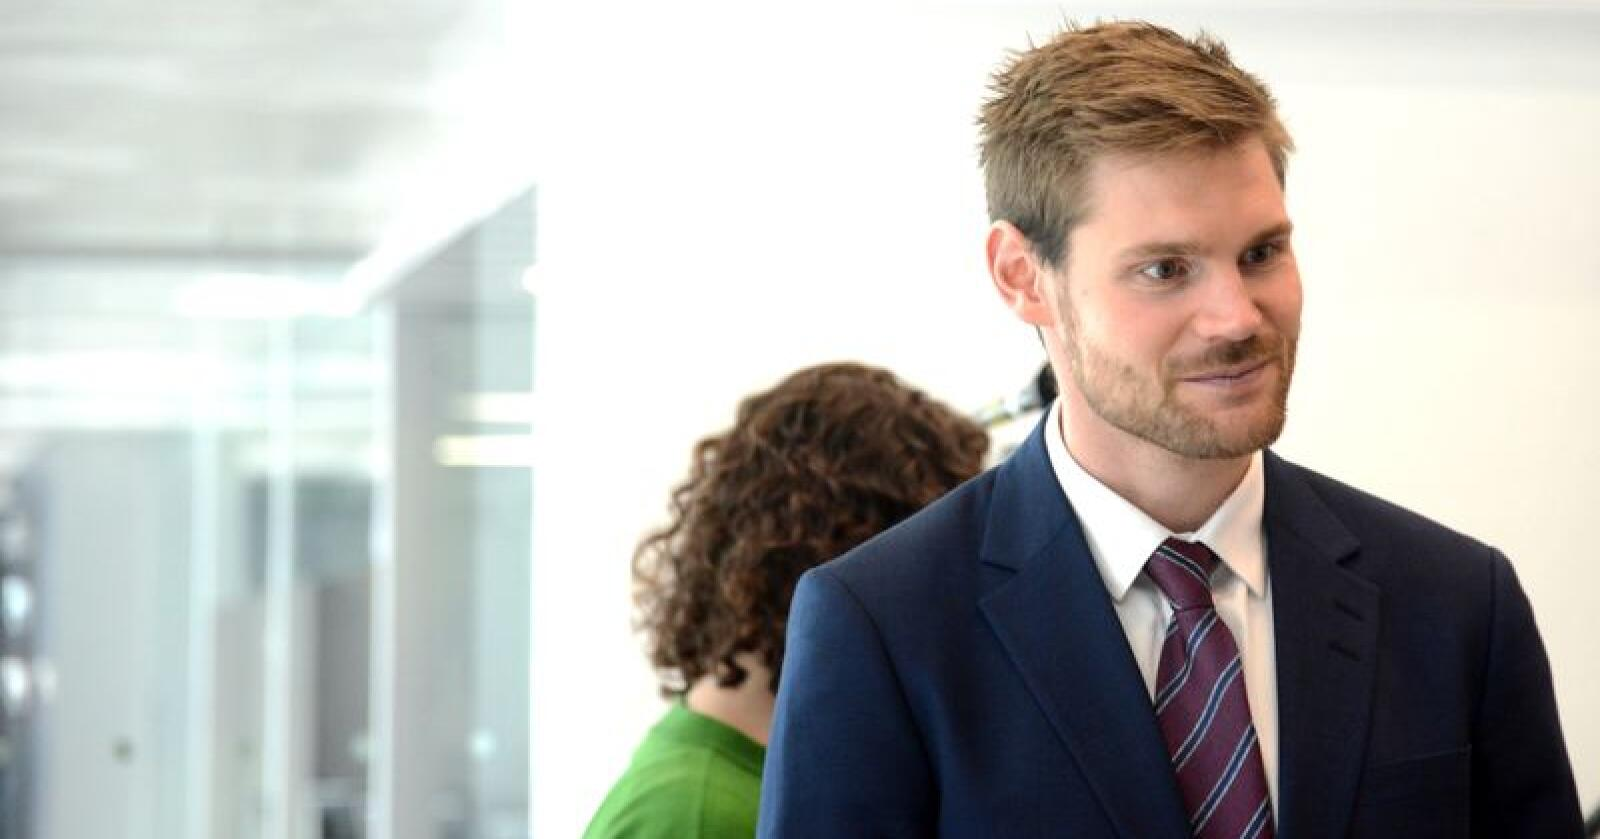 Nils Kristen Sandtrøen, landbrukspolitisk talsperson fra Ap, reagerer på Dales nei. Foto: Siri Juell Rasmussen.